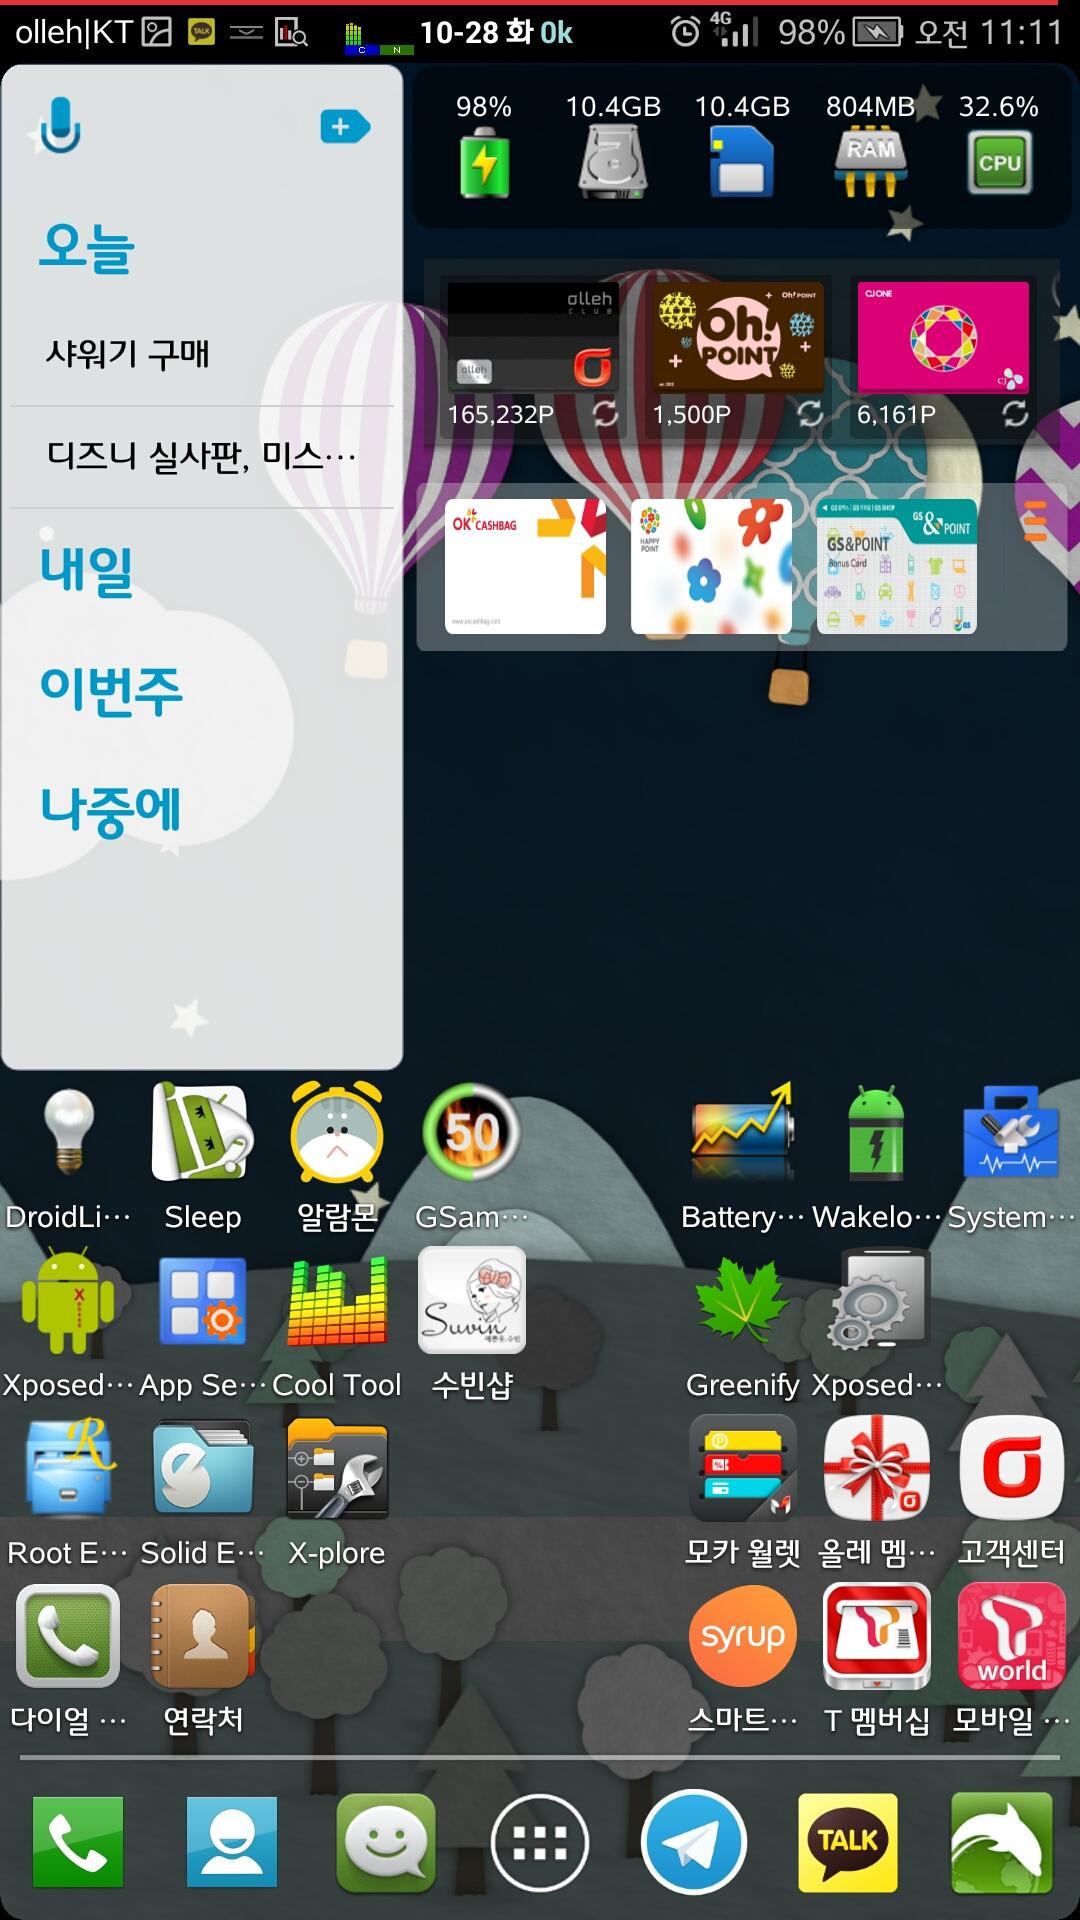 Screenshot_2014-10-28-11-11-57.jpeg